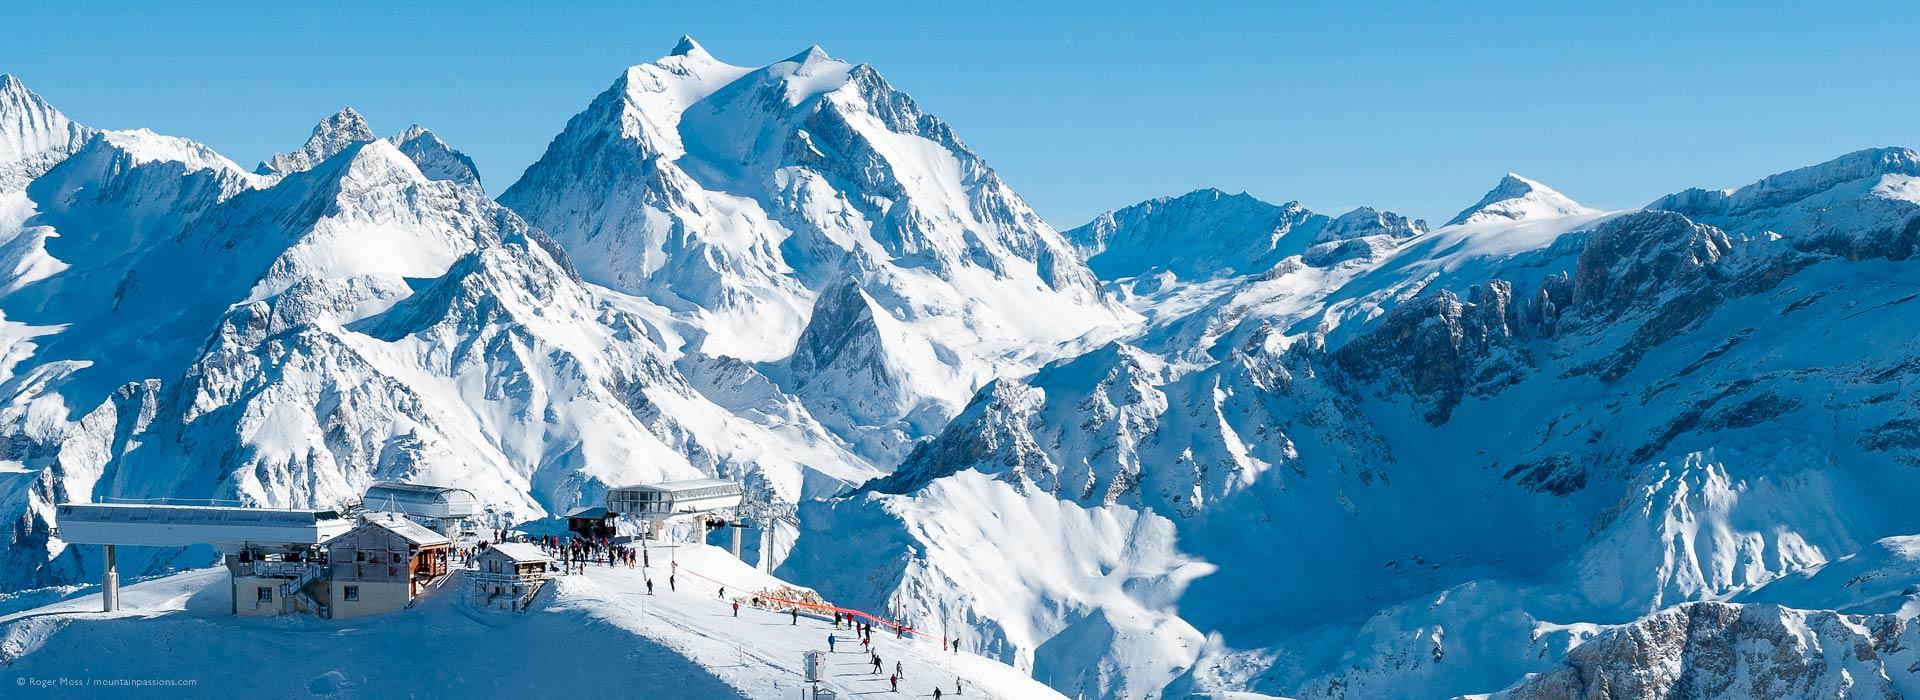 ski resort reviews - mountainpassions